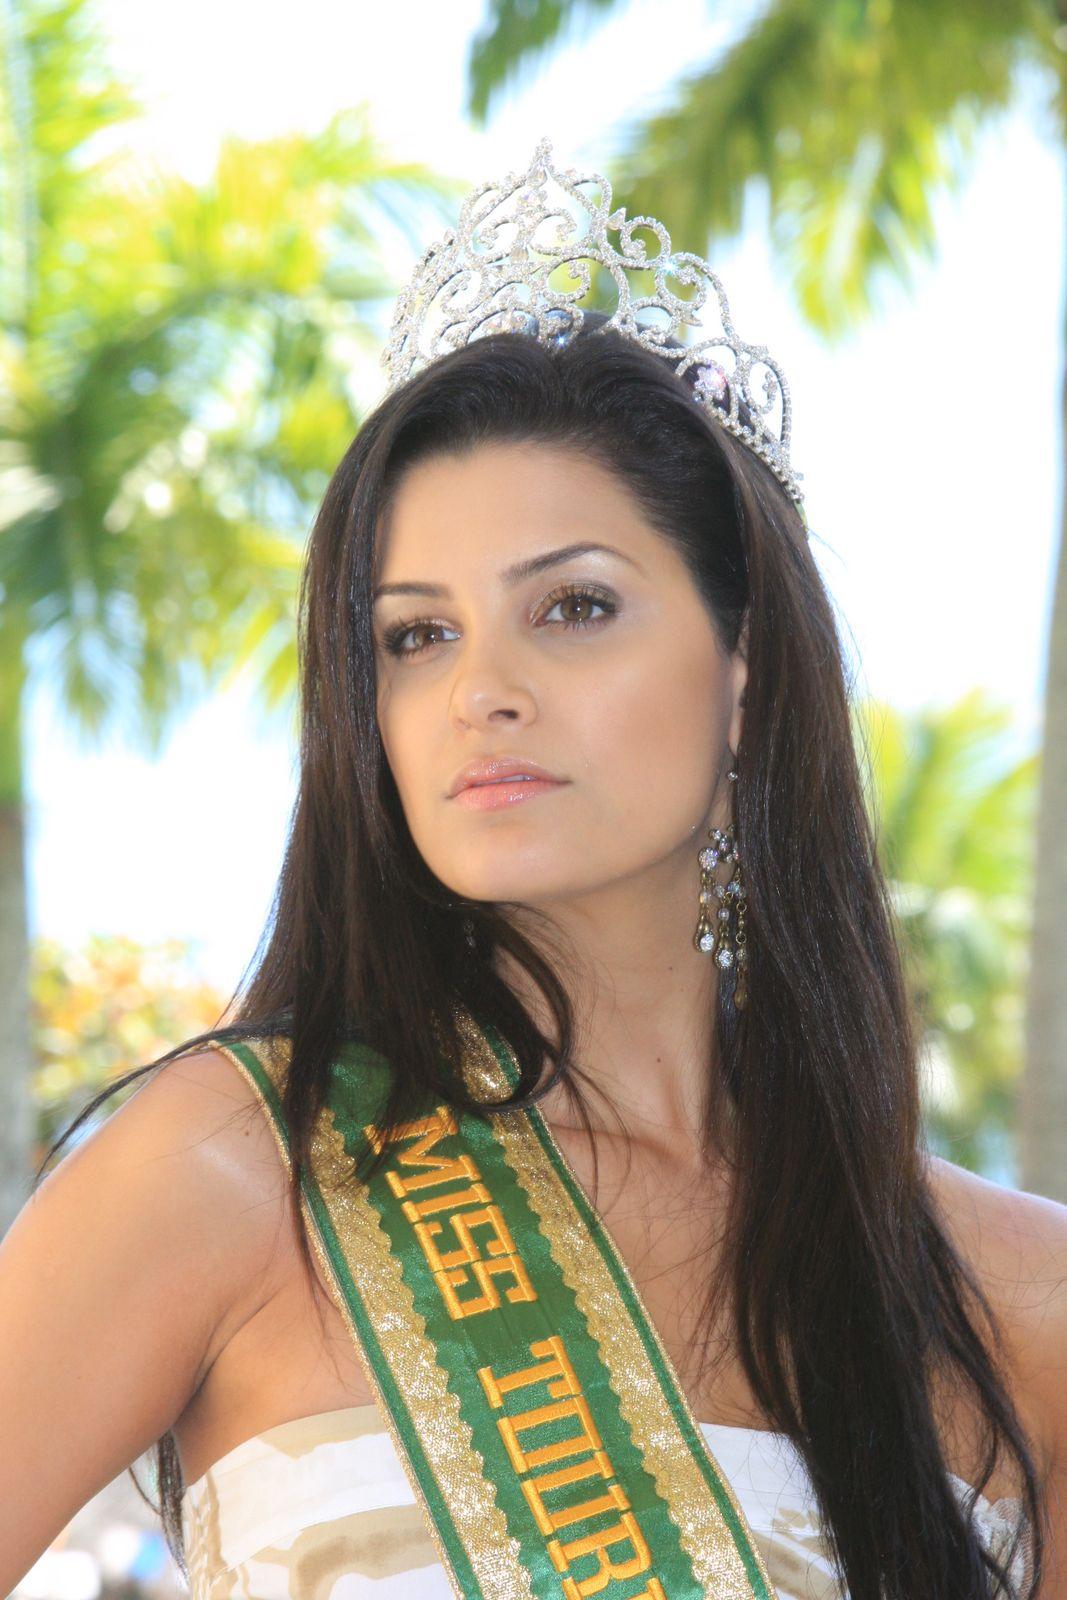 vivian noronha, rainha hispanoamericana 2008. suplente. - Página 4 Tklmgdxz